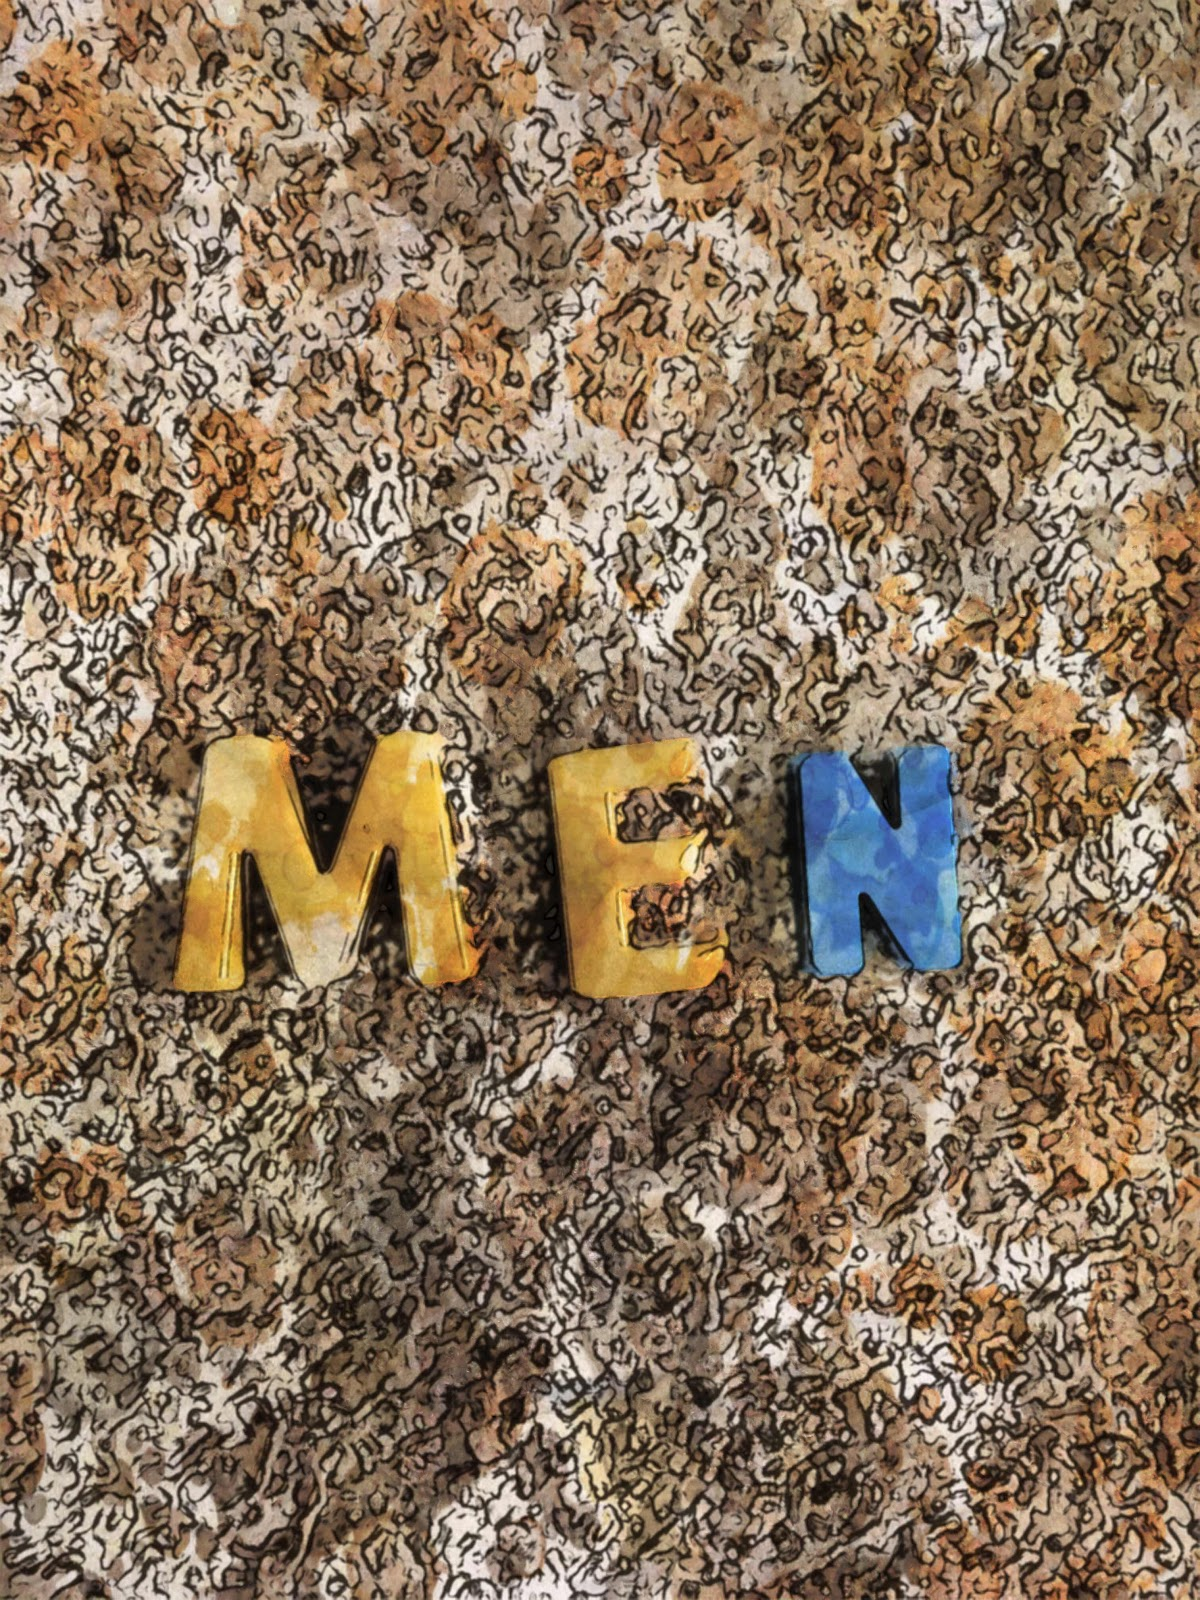 Men free pictures